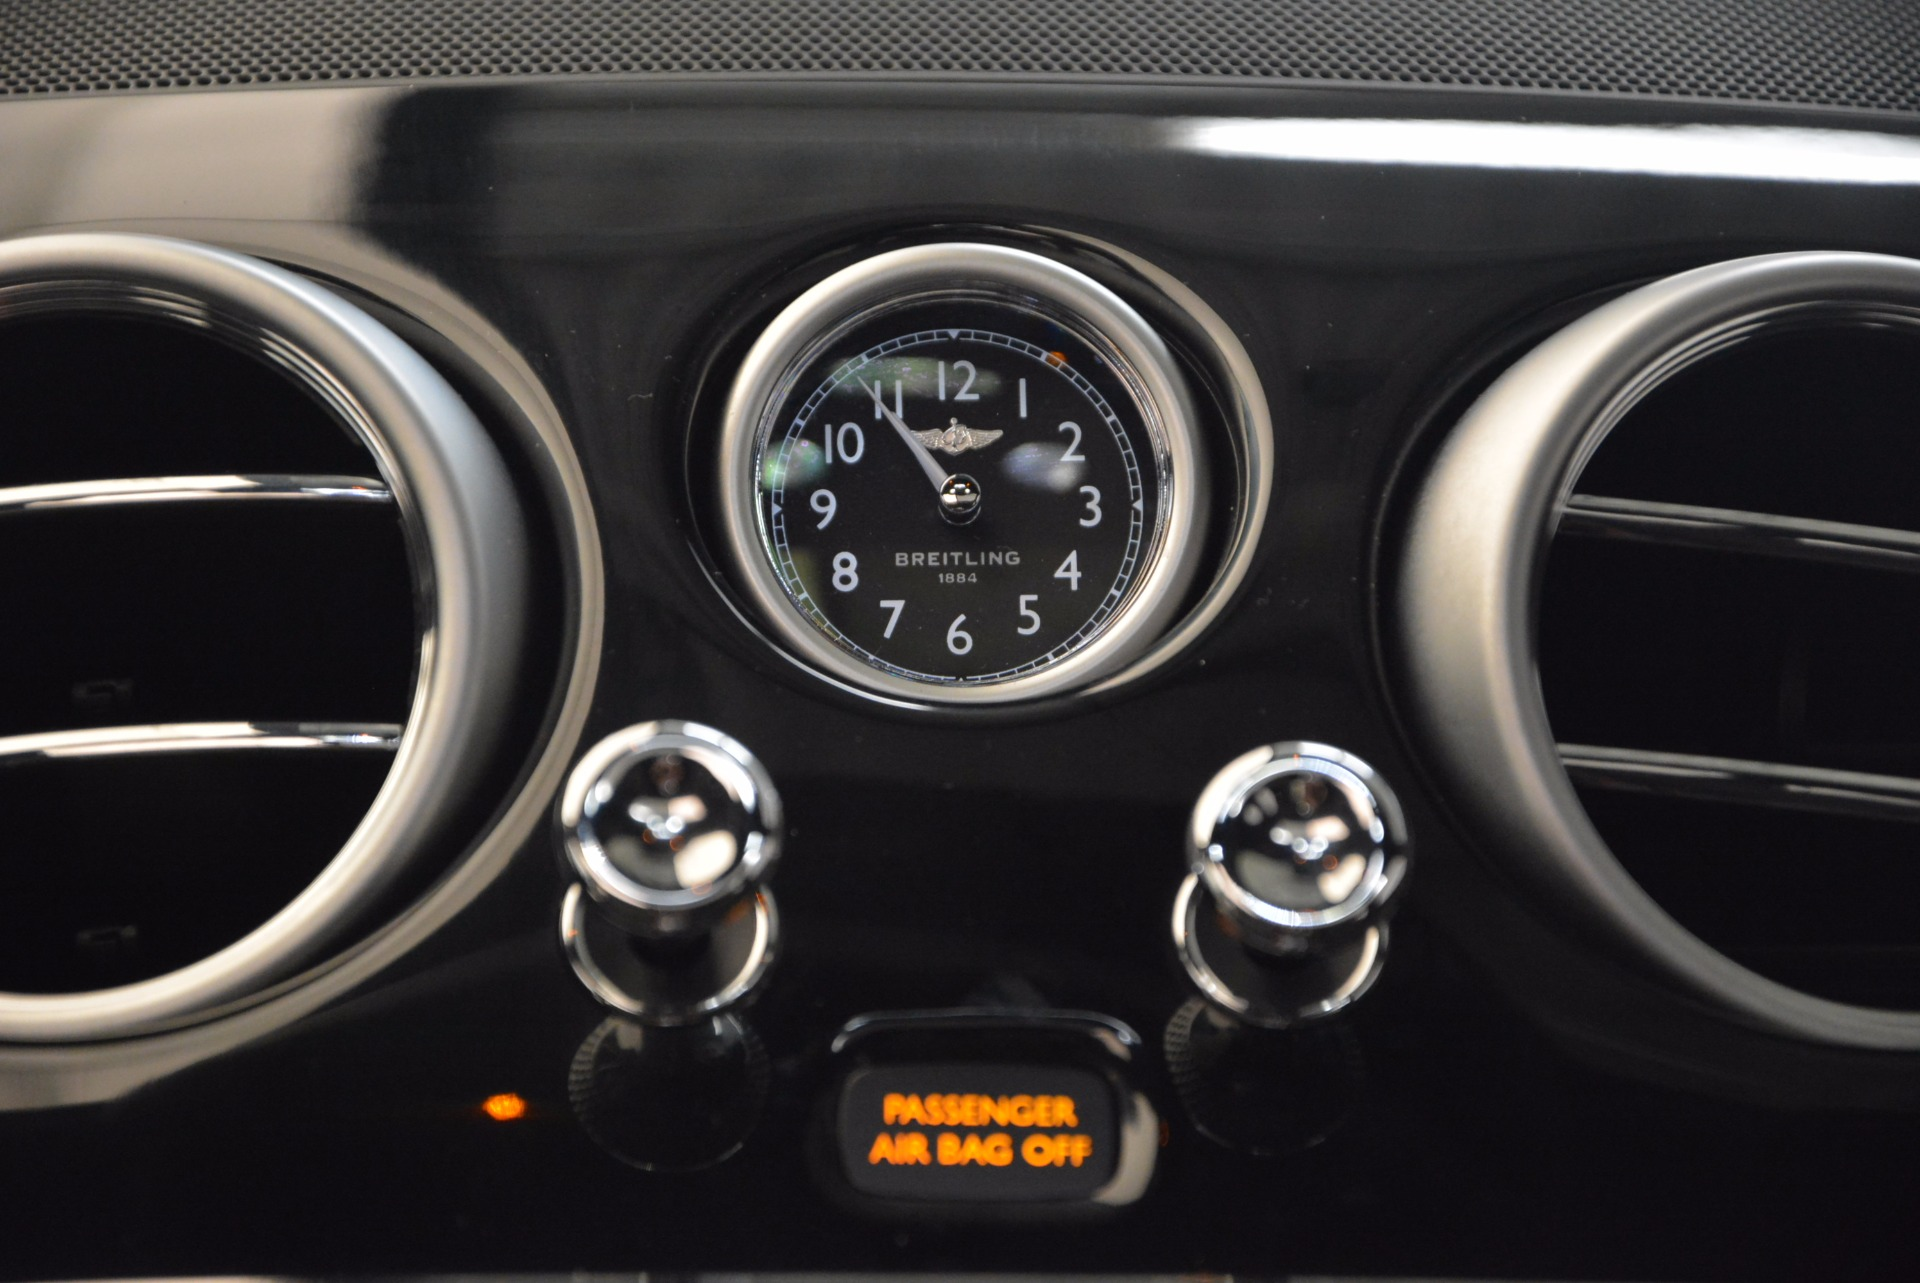 Used 2015 Bentley Flying Spur V8 For Sale In Westport, CT 1199_p30